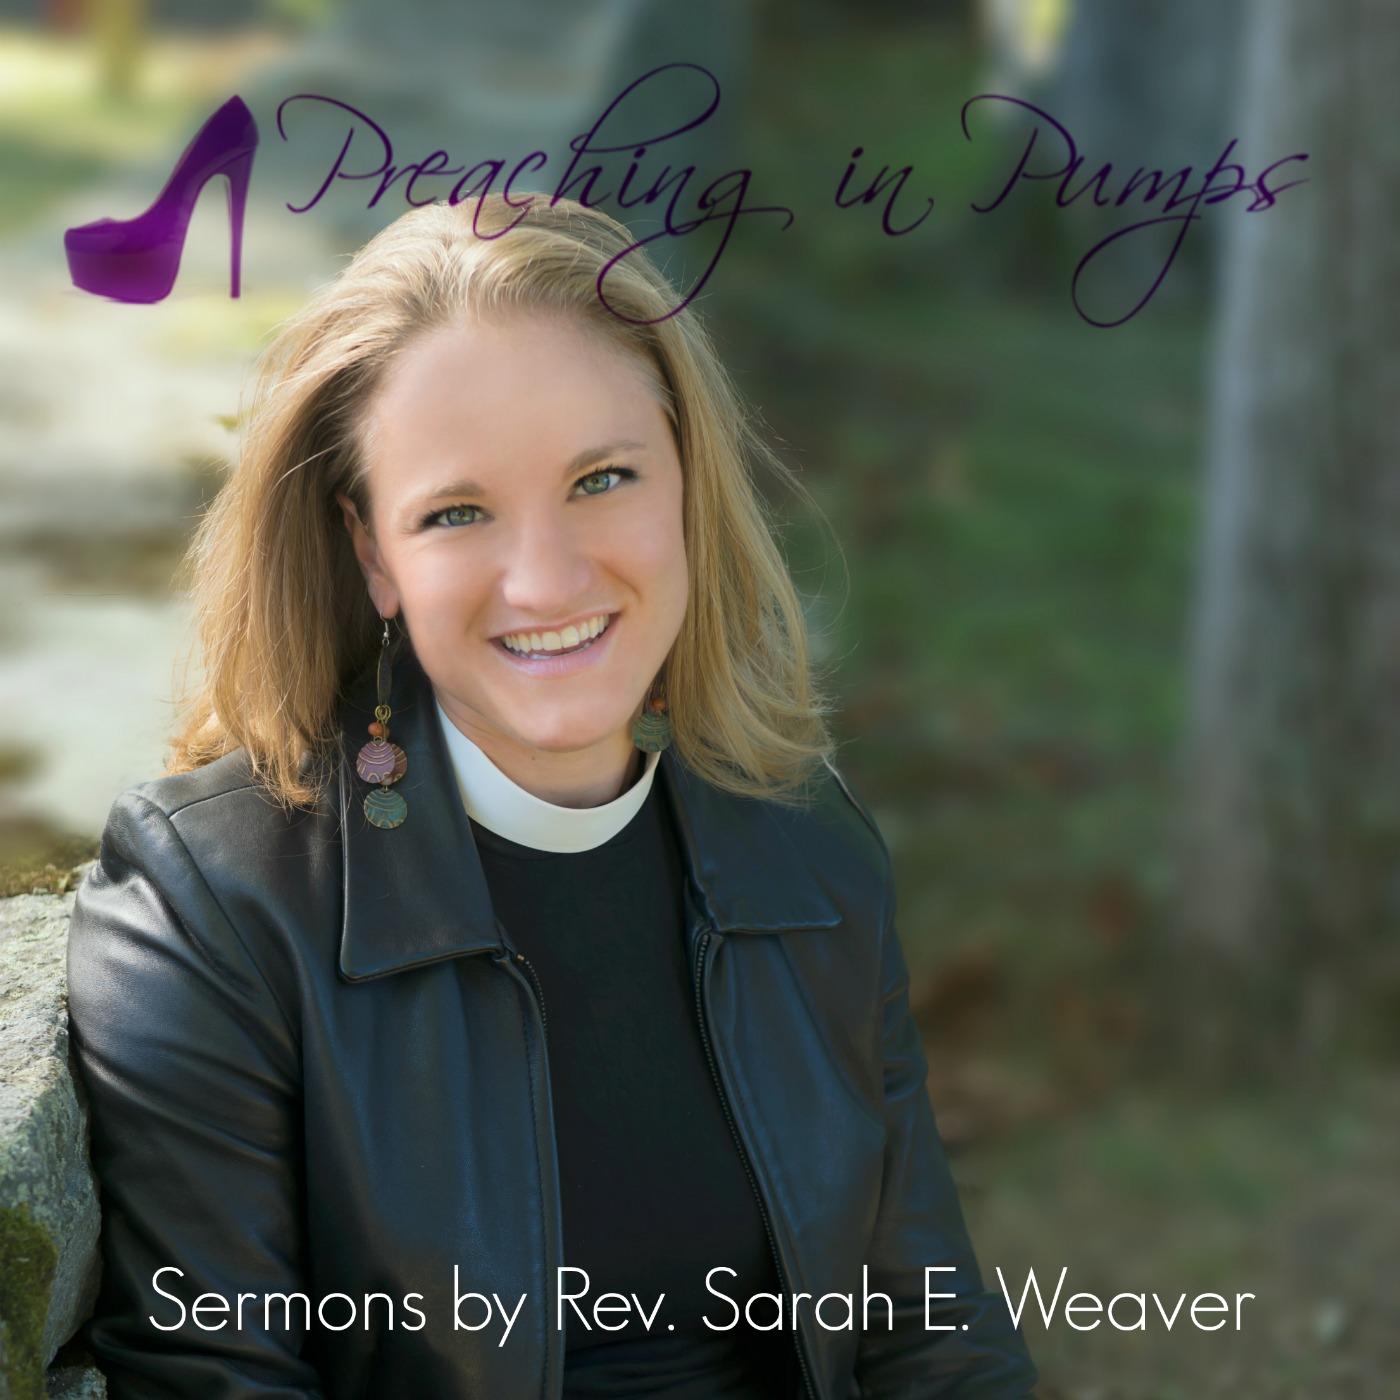 Preaching in Pumps | Sermons by Rev. Sarah E. Weaver show art